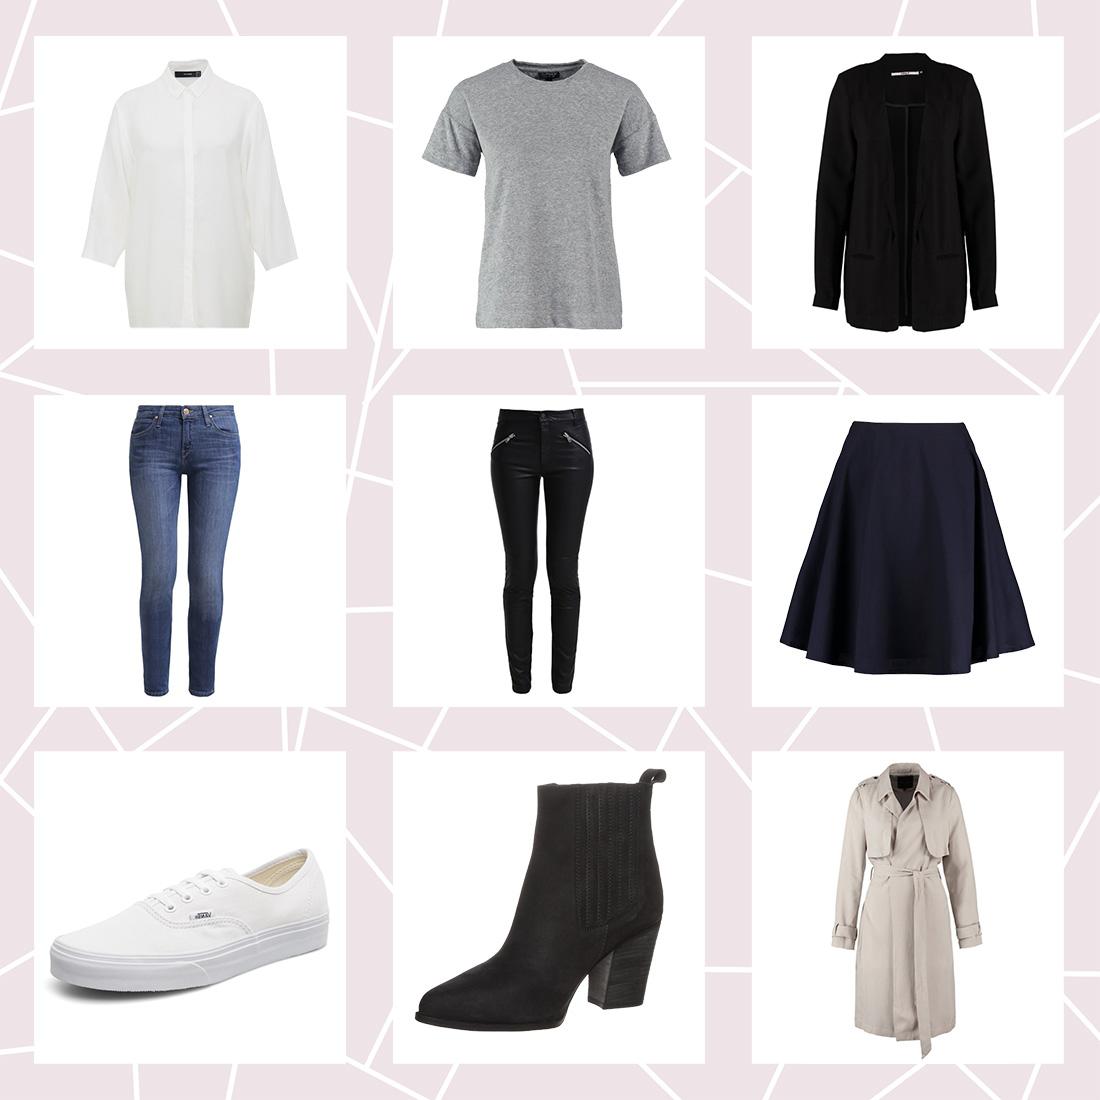 3df0e7a115cf9 9 all time must have basic pieces - bekleidet - fashionblog ...